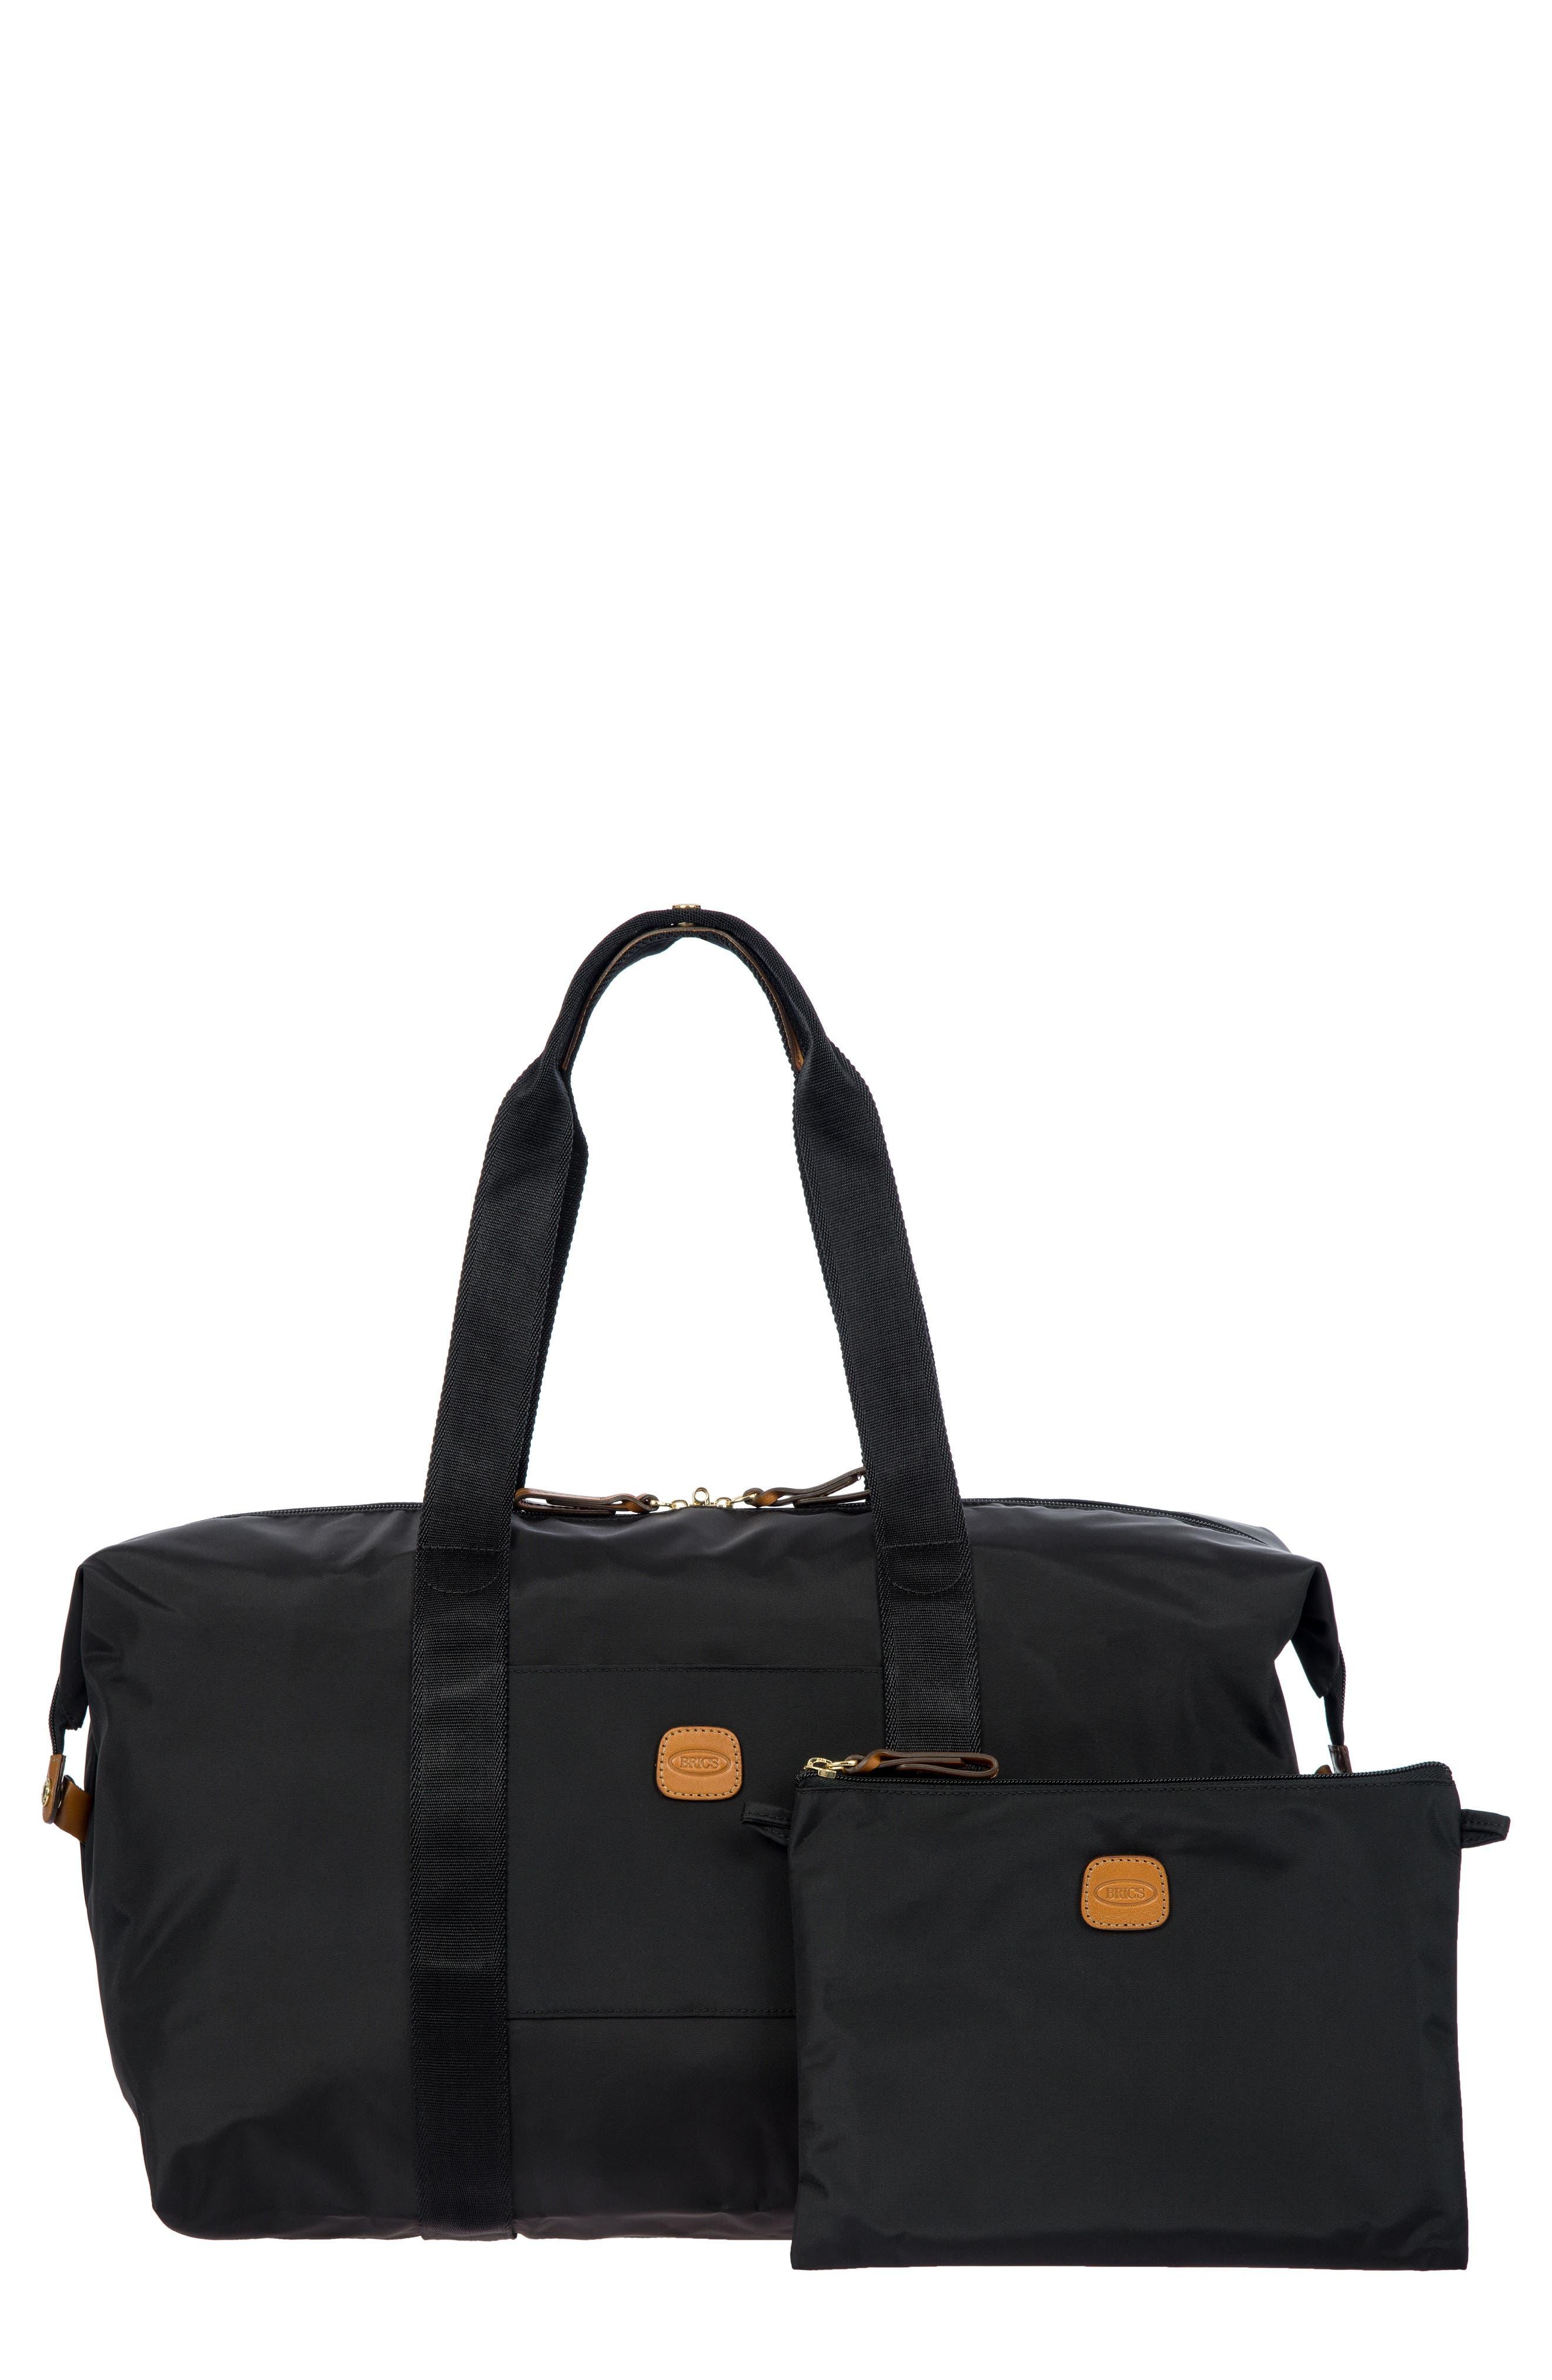 X-Bag 18-Inch Folding Duffel Bag